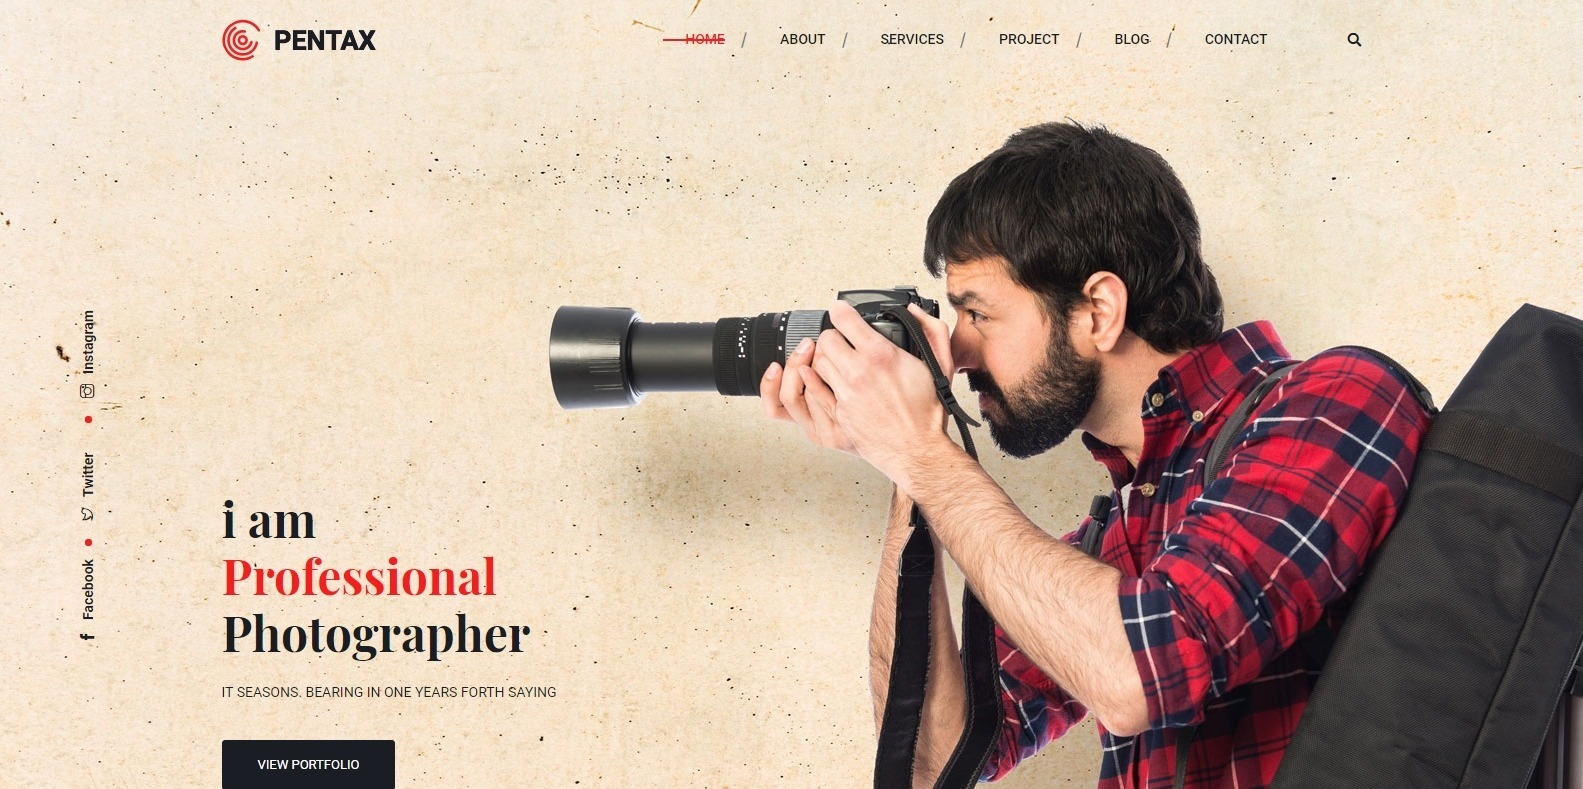 pentax-gallery-website-template